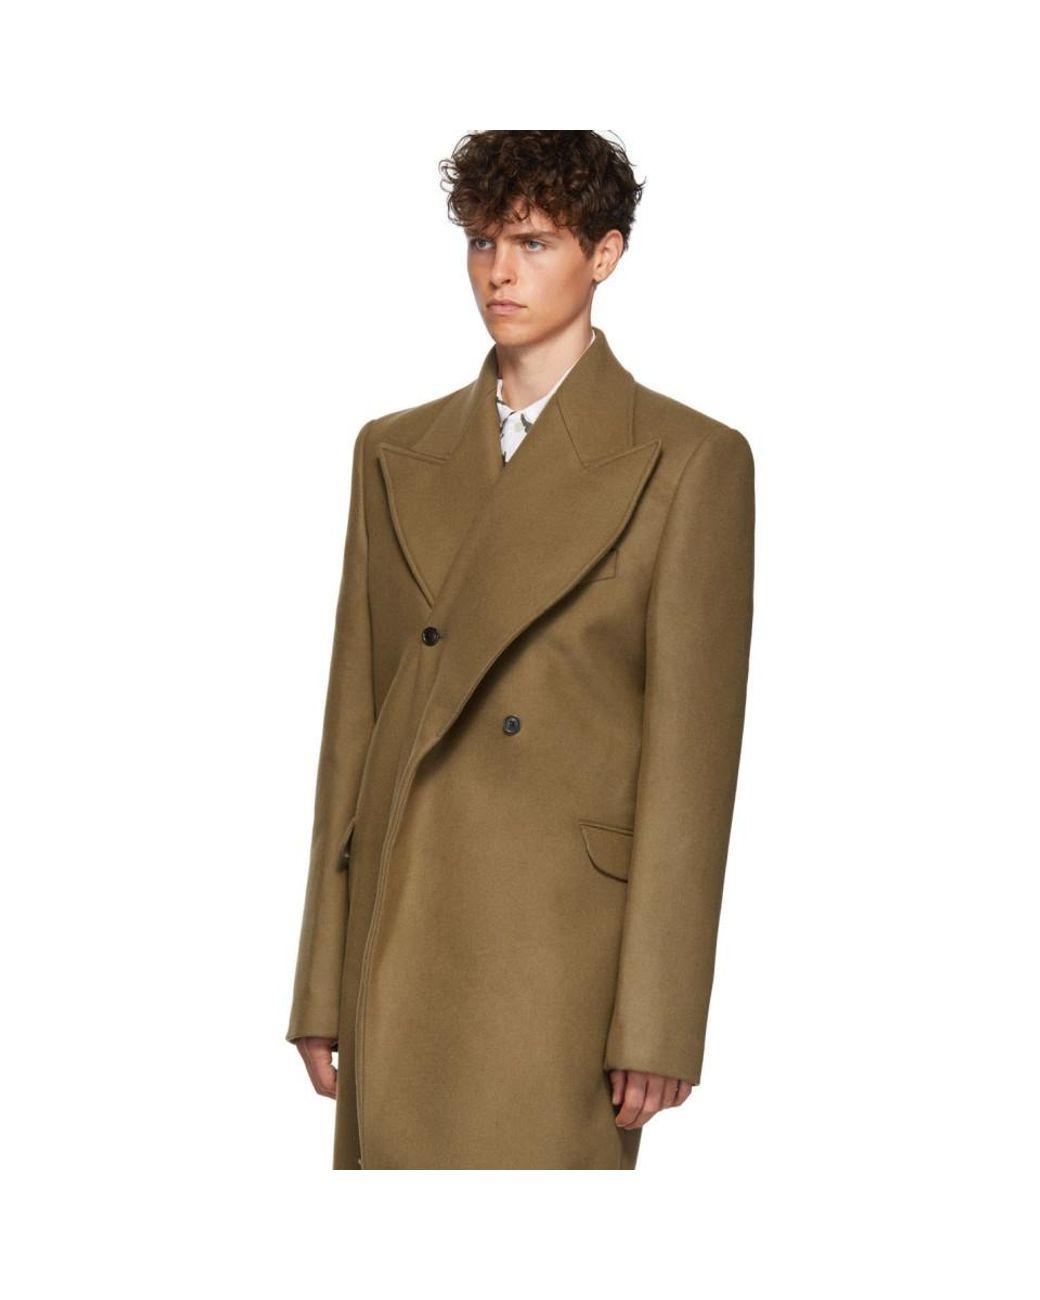 Men's Tan Double Lapel Coat